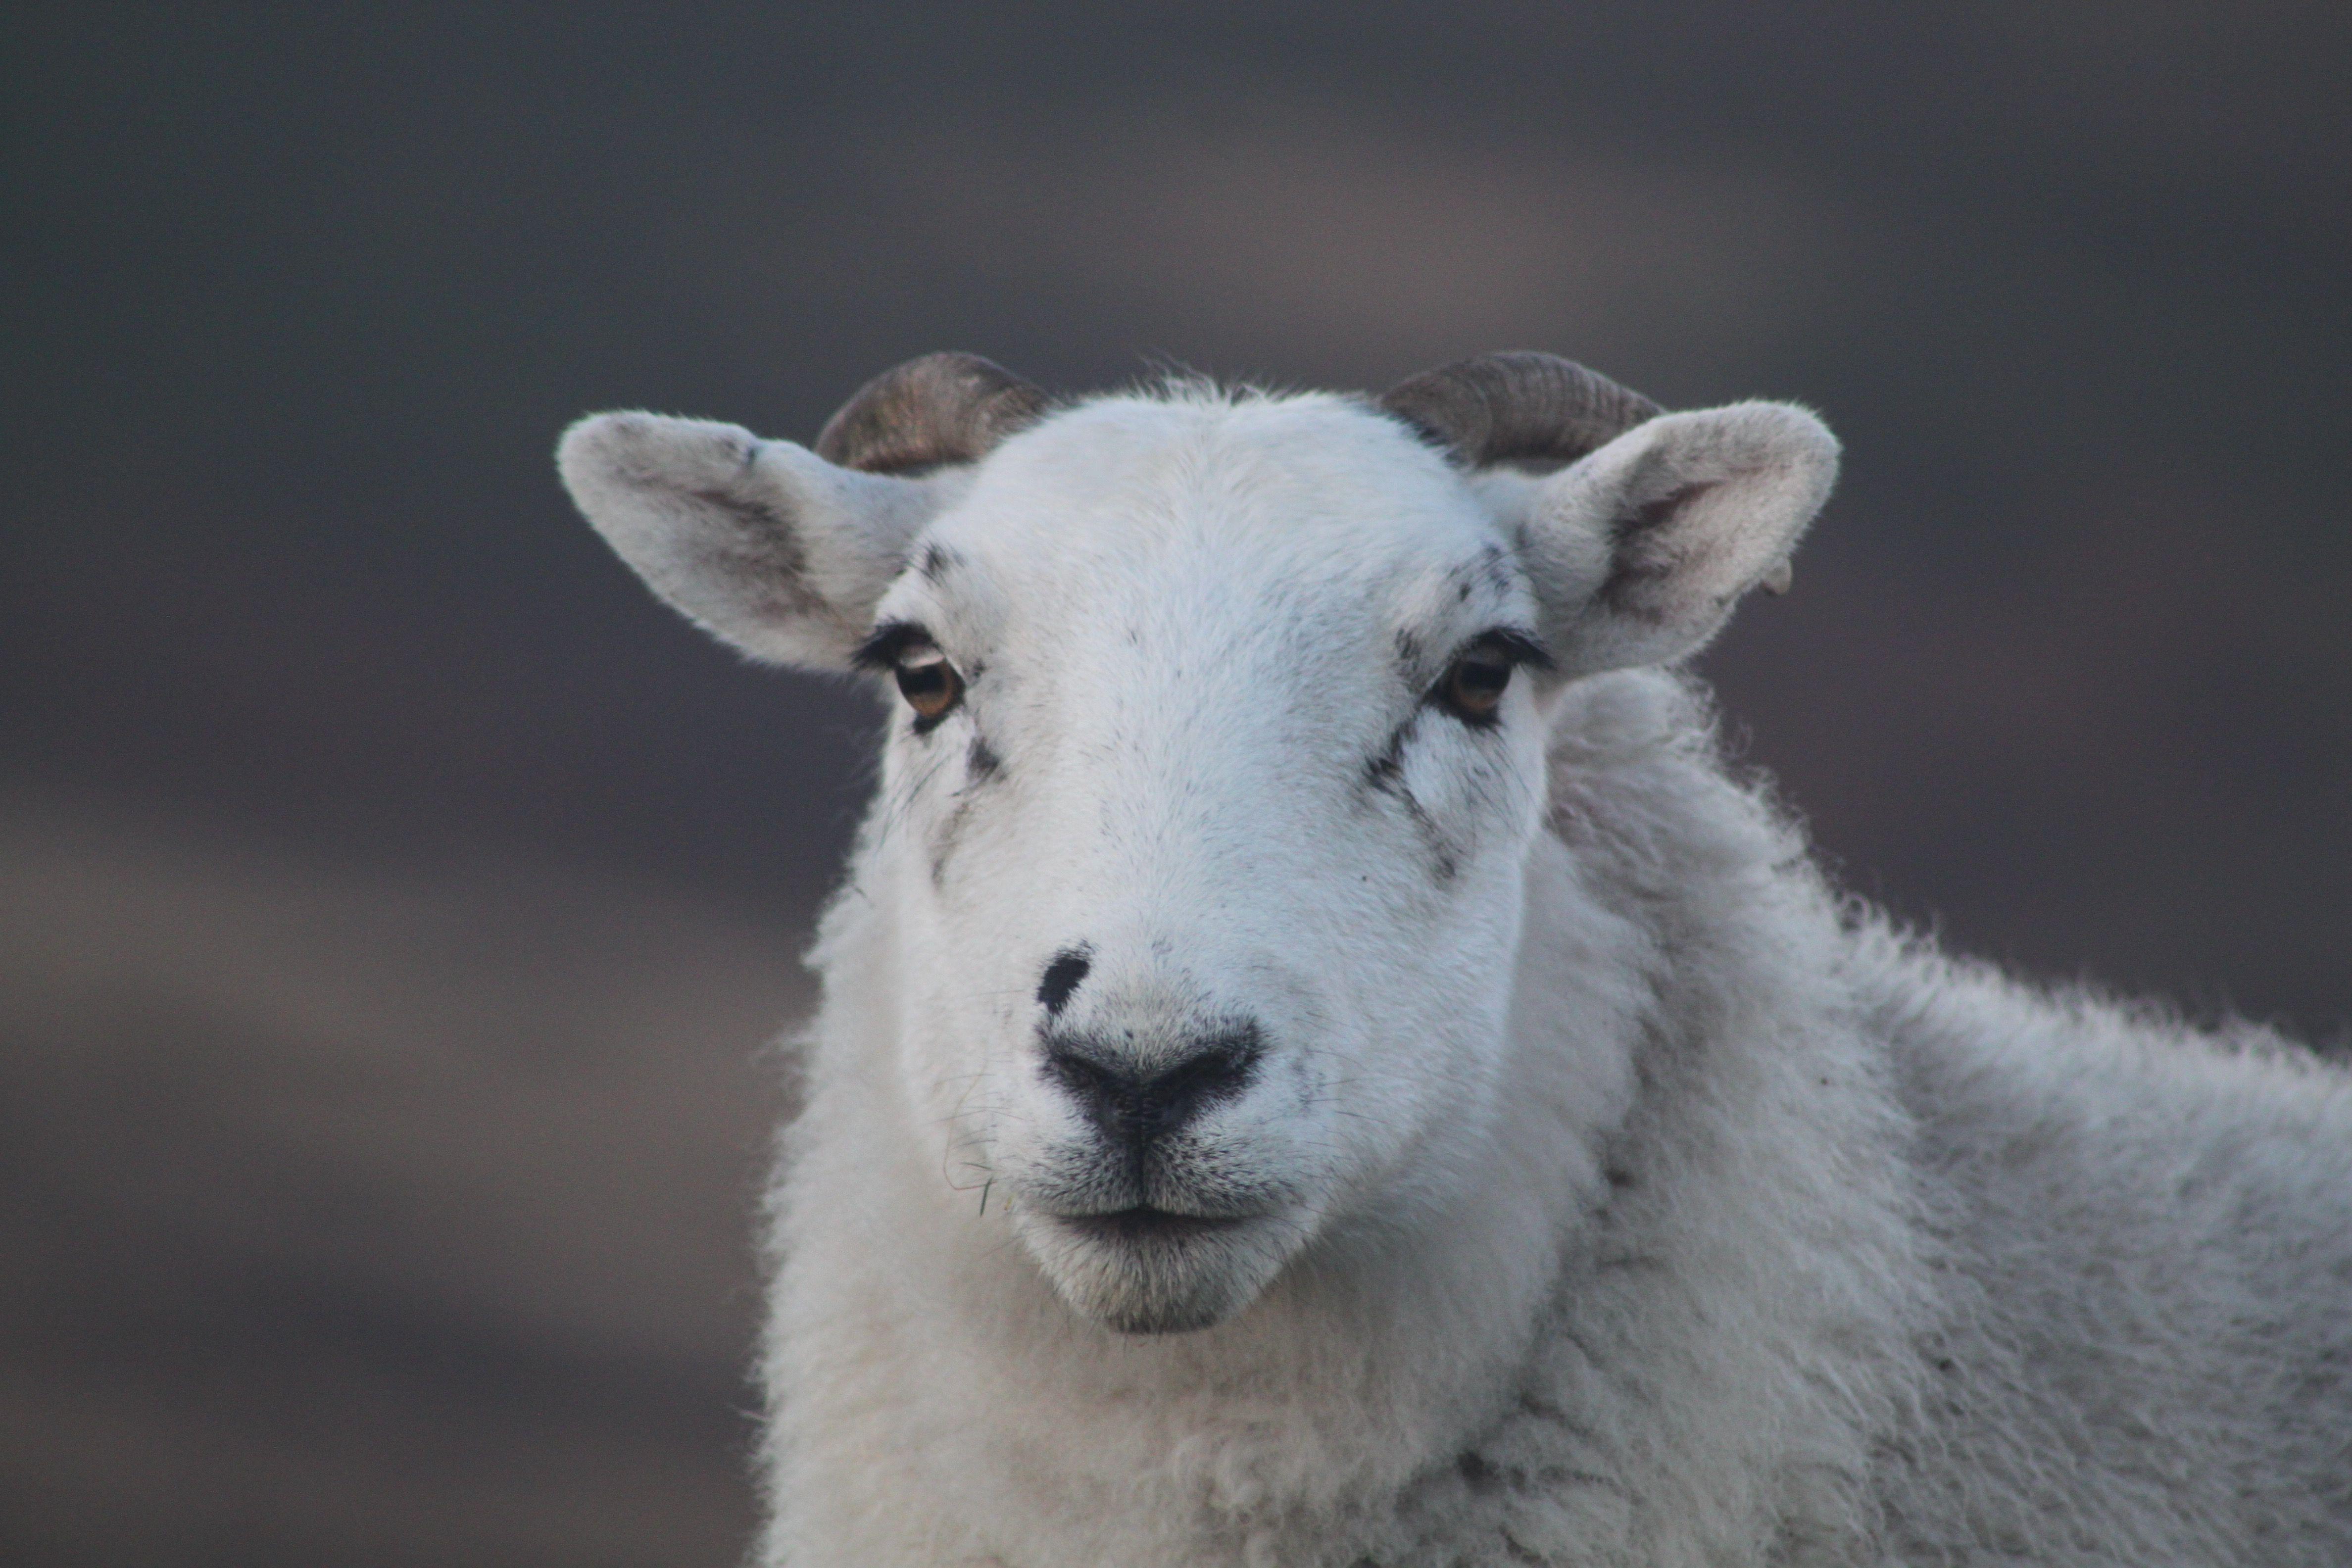 Goat Prince Edward Island